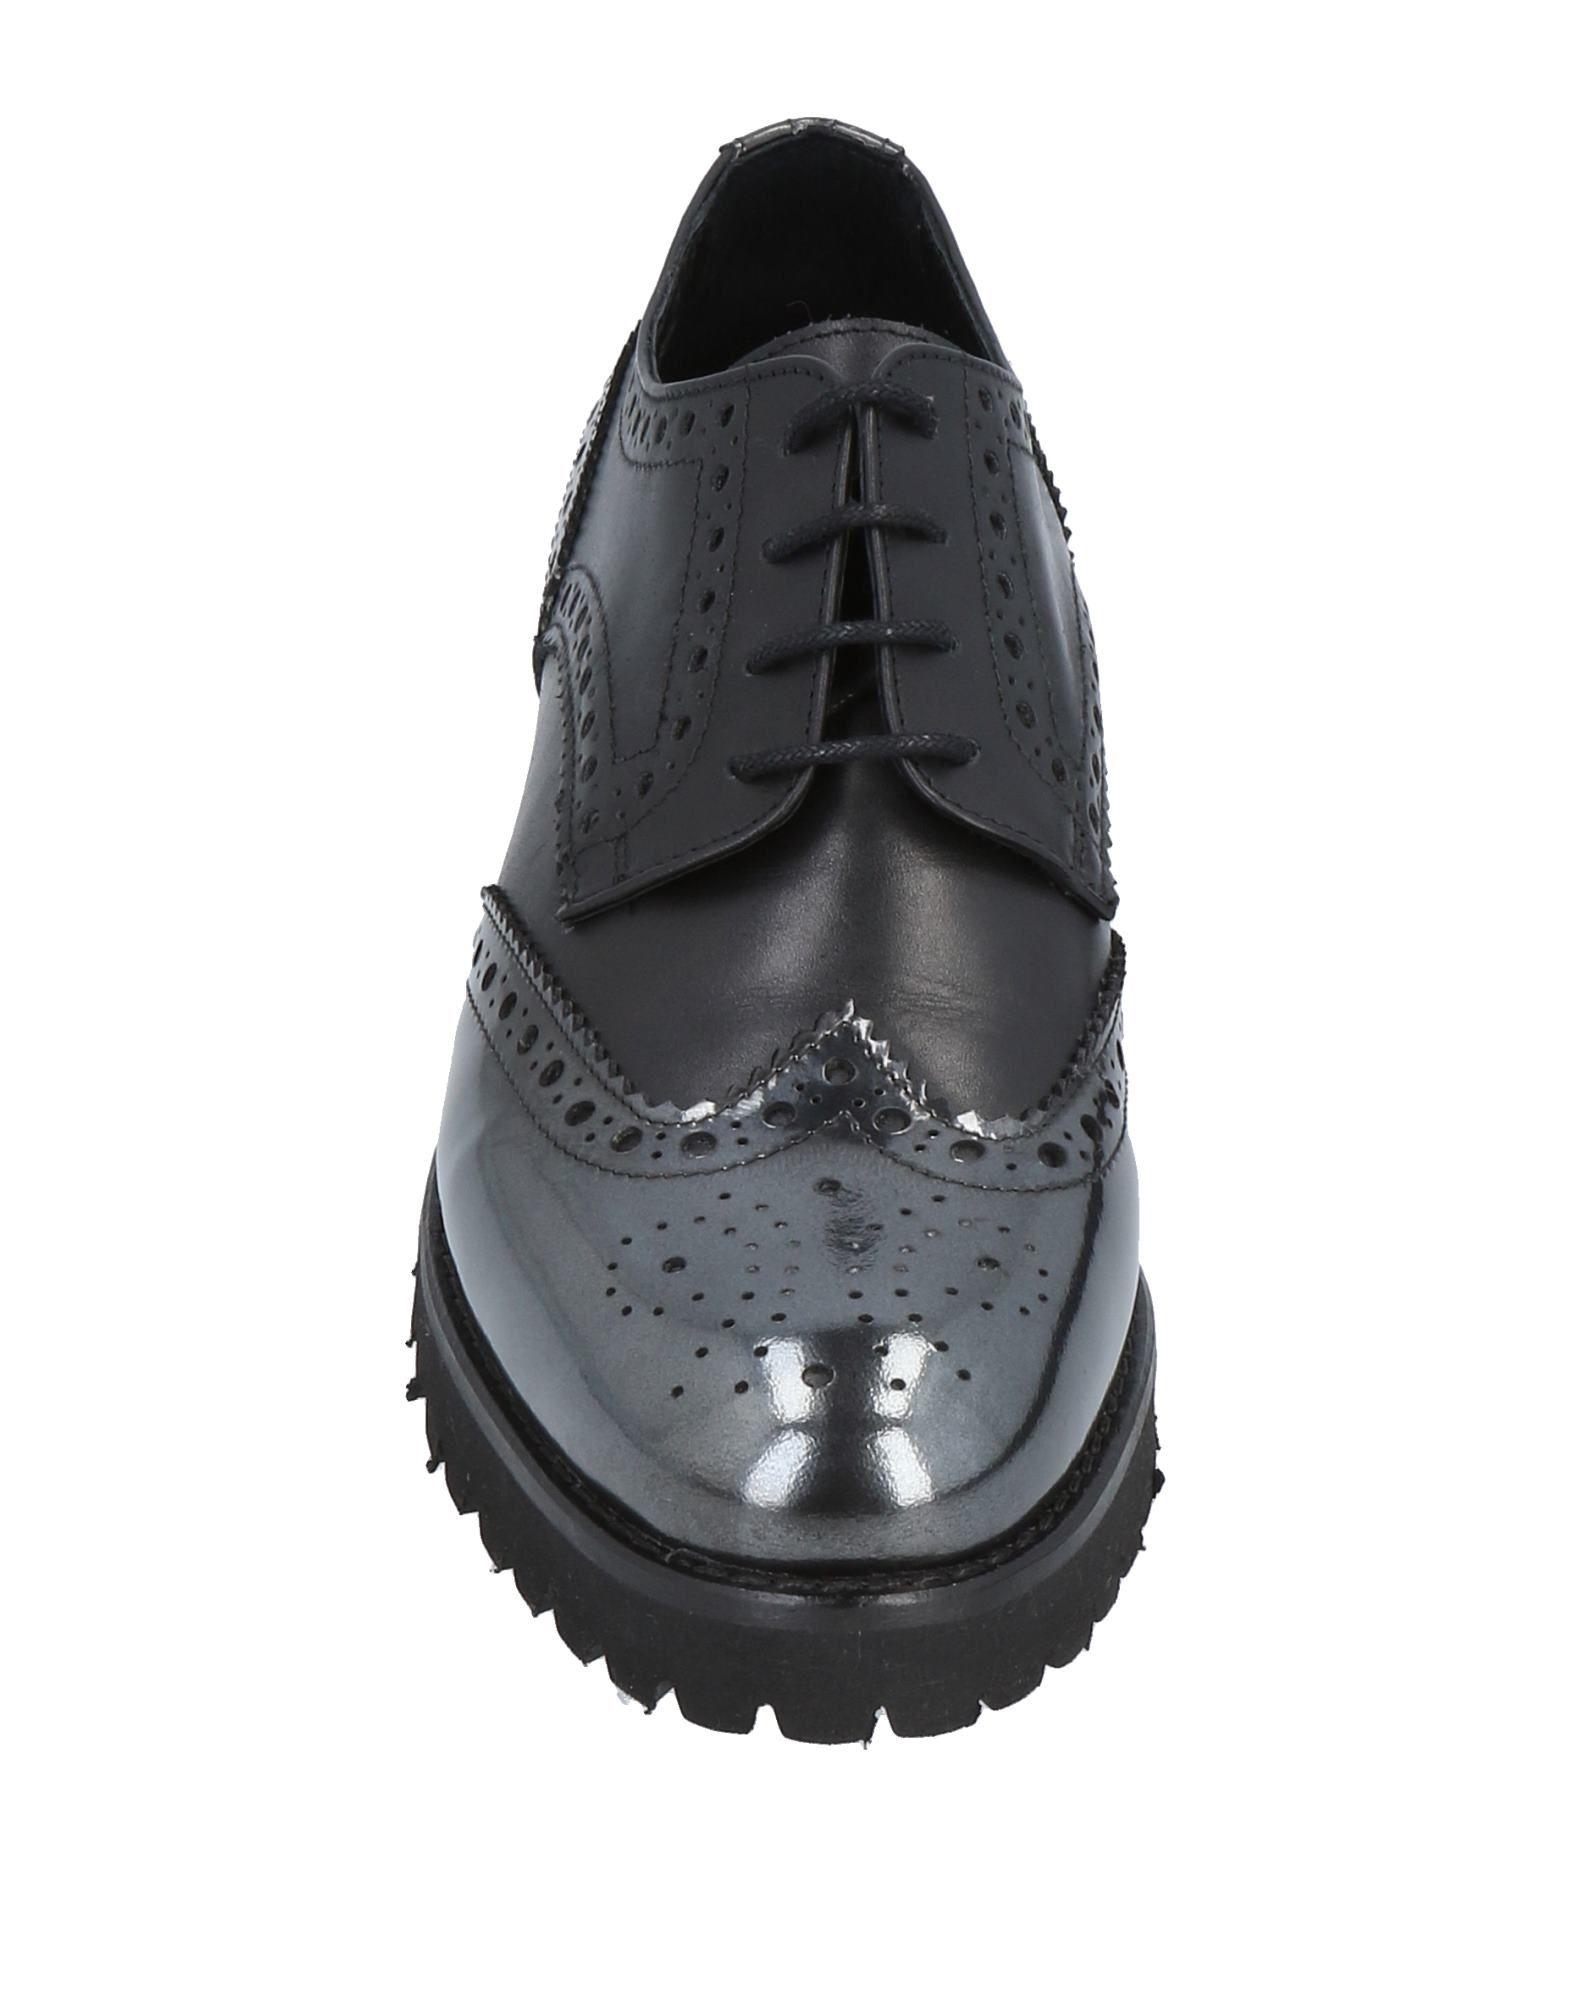 Couture Schnürschuhe Damen  11485166QE Gute Qualität beliebte Schuhe